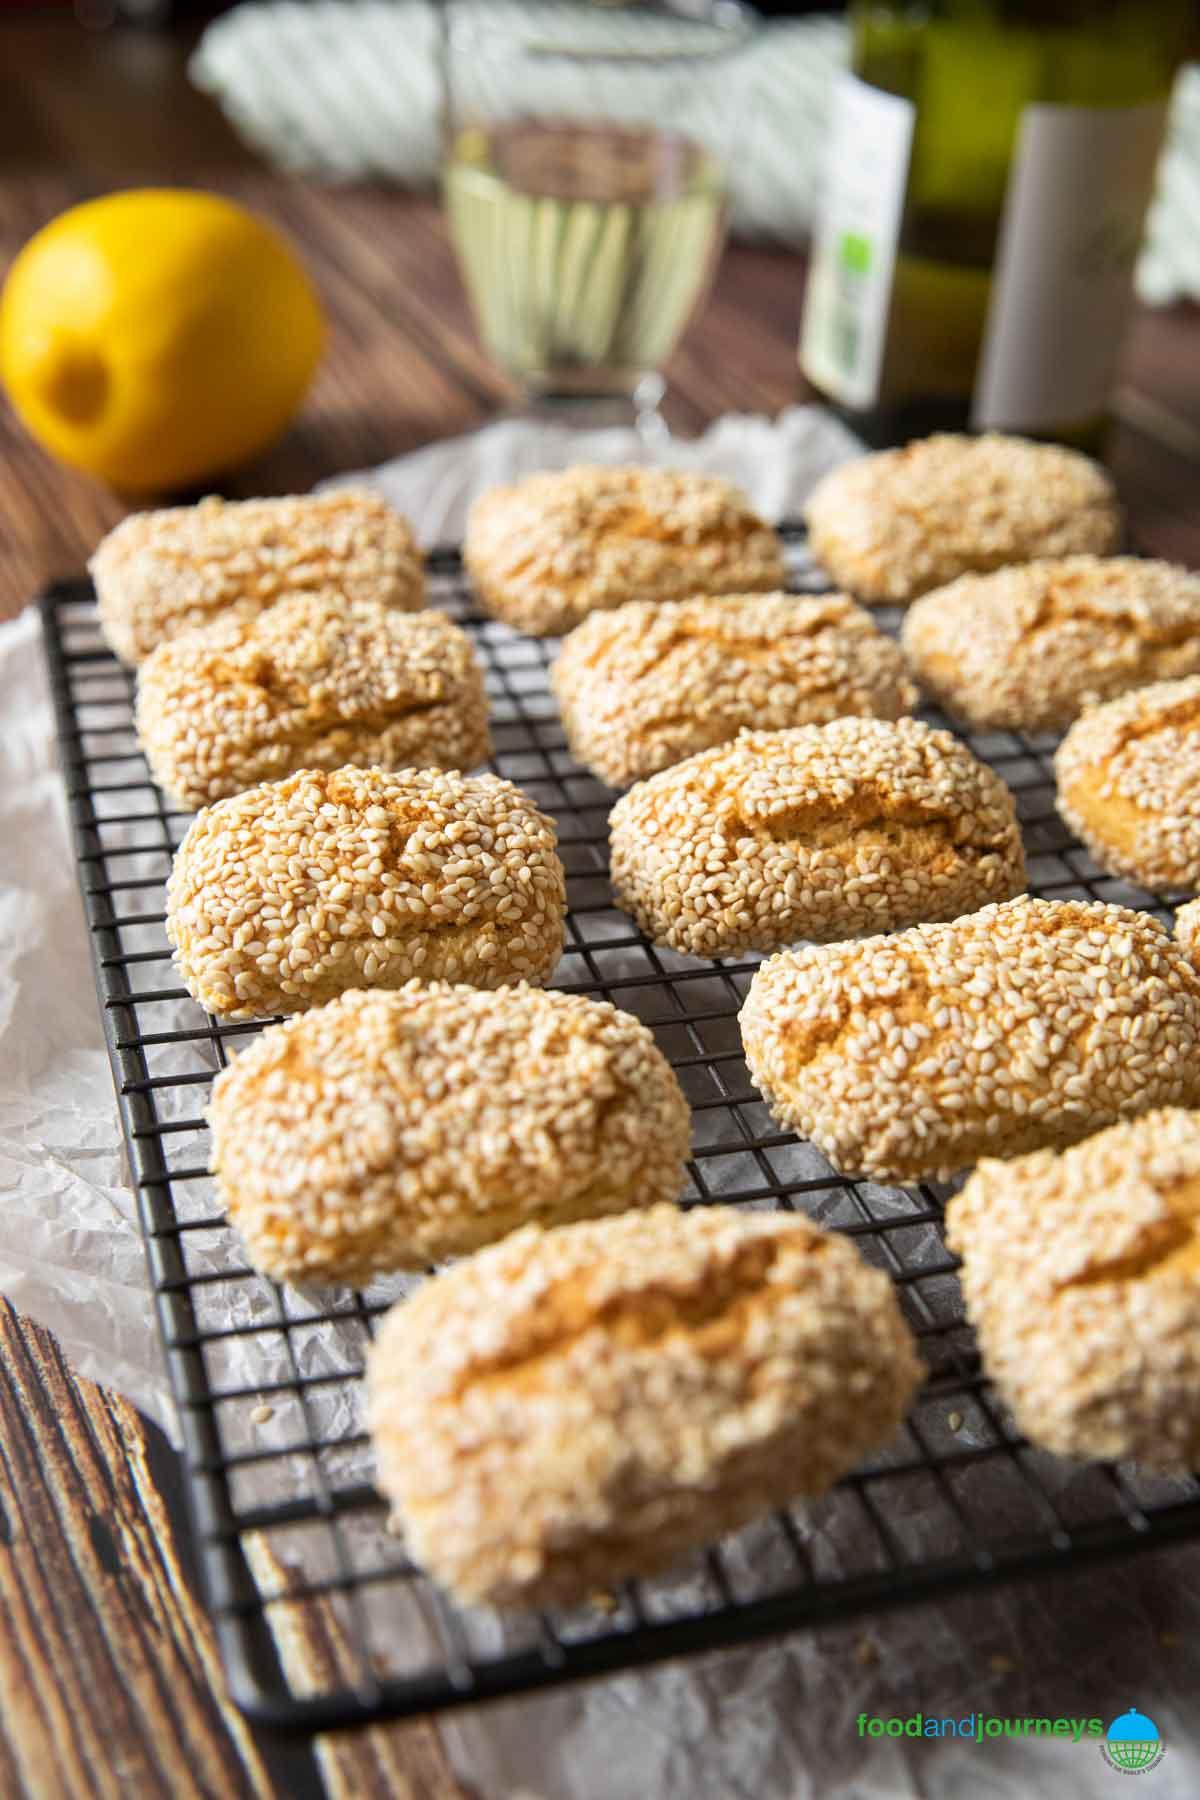 Freshly baked Sicilian sesame cookies, on a cooling rack.